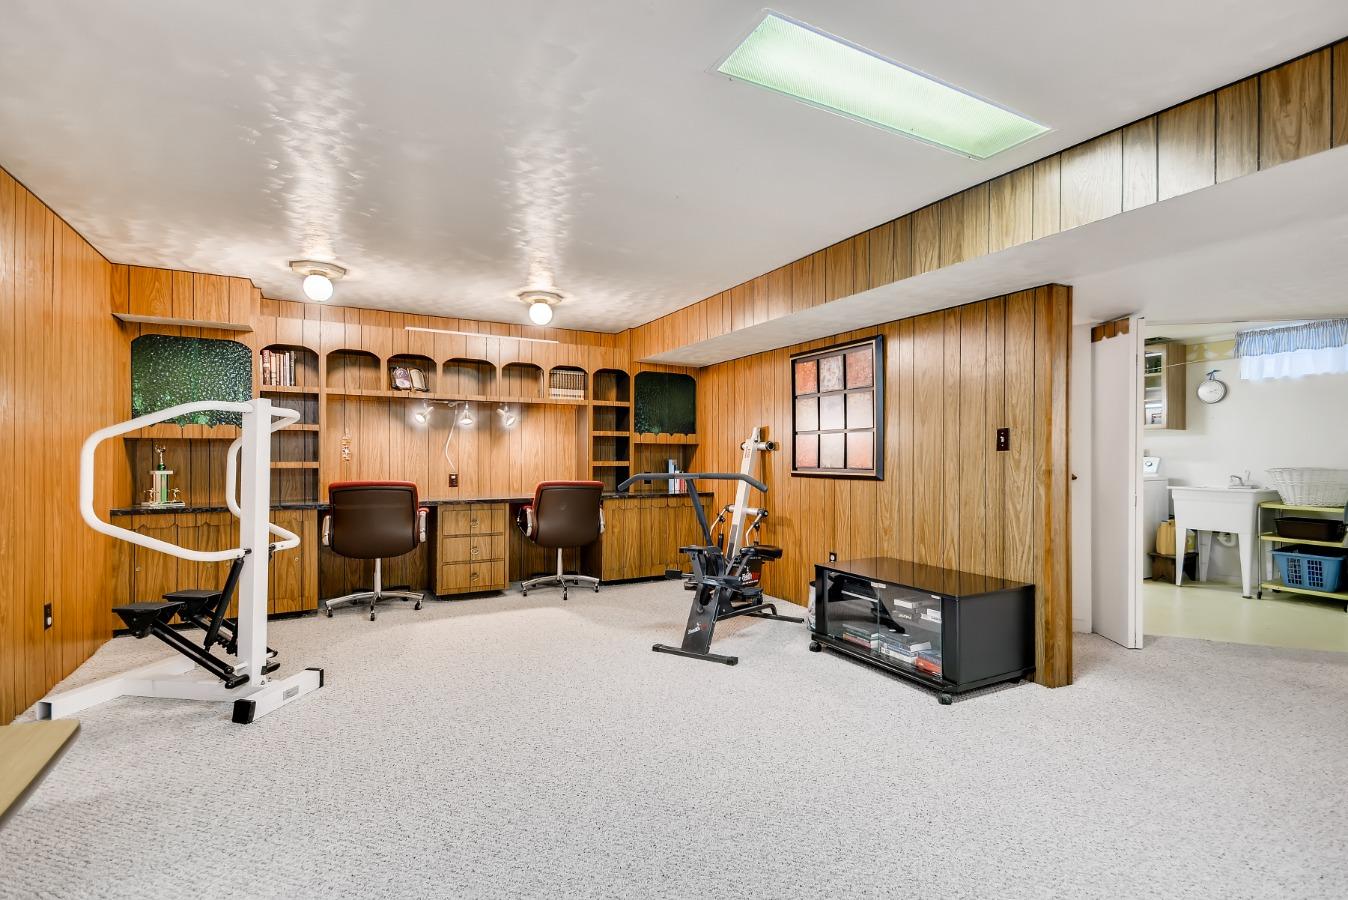 Basement Rec Room! Everyone Can Live A Little!